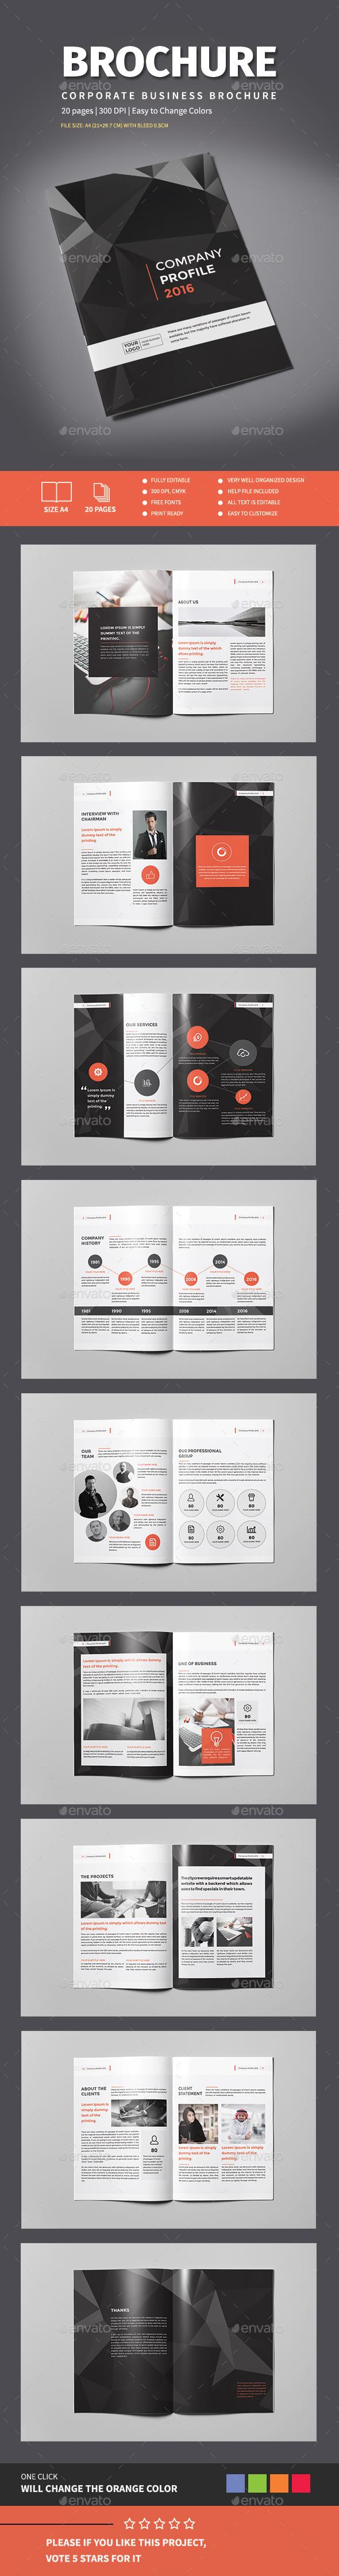 The Company Brochure - Corporate Brochures